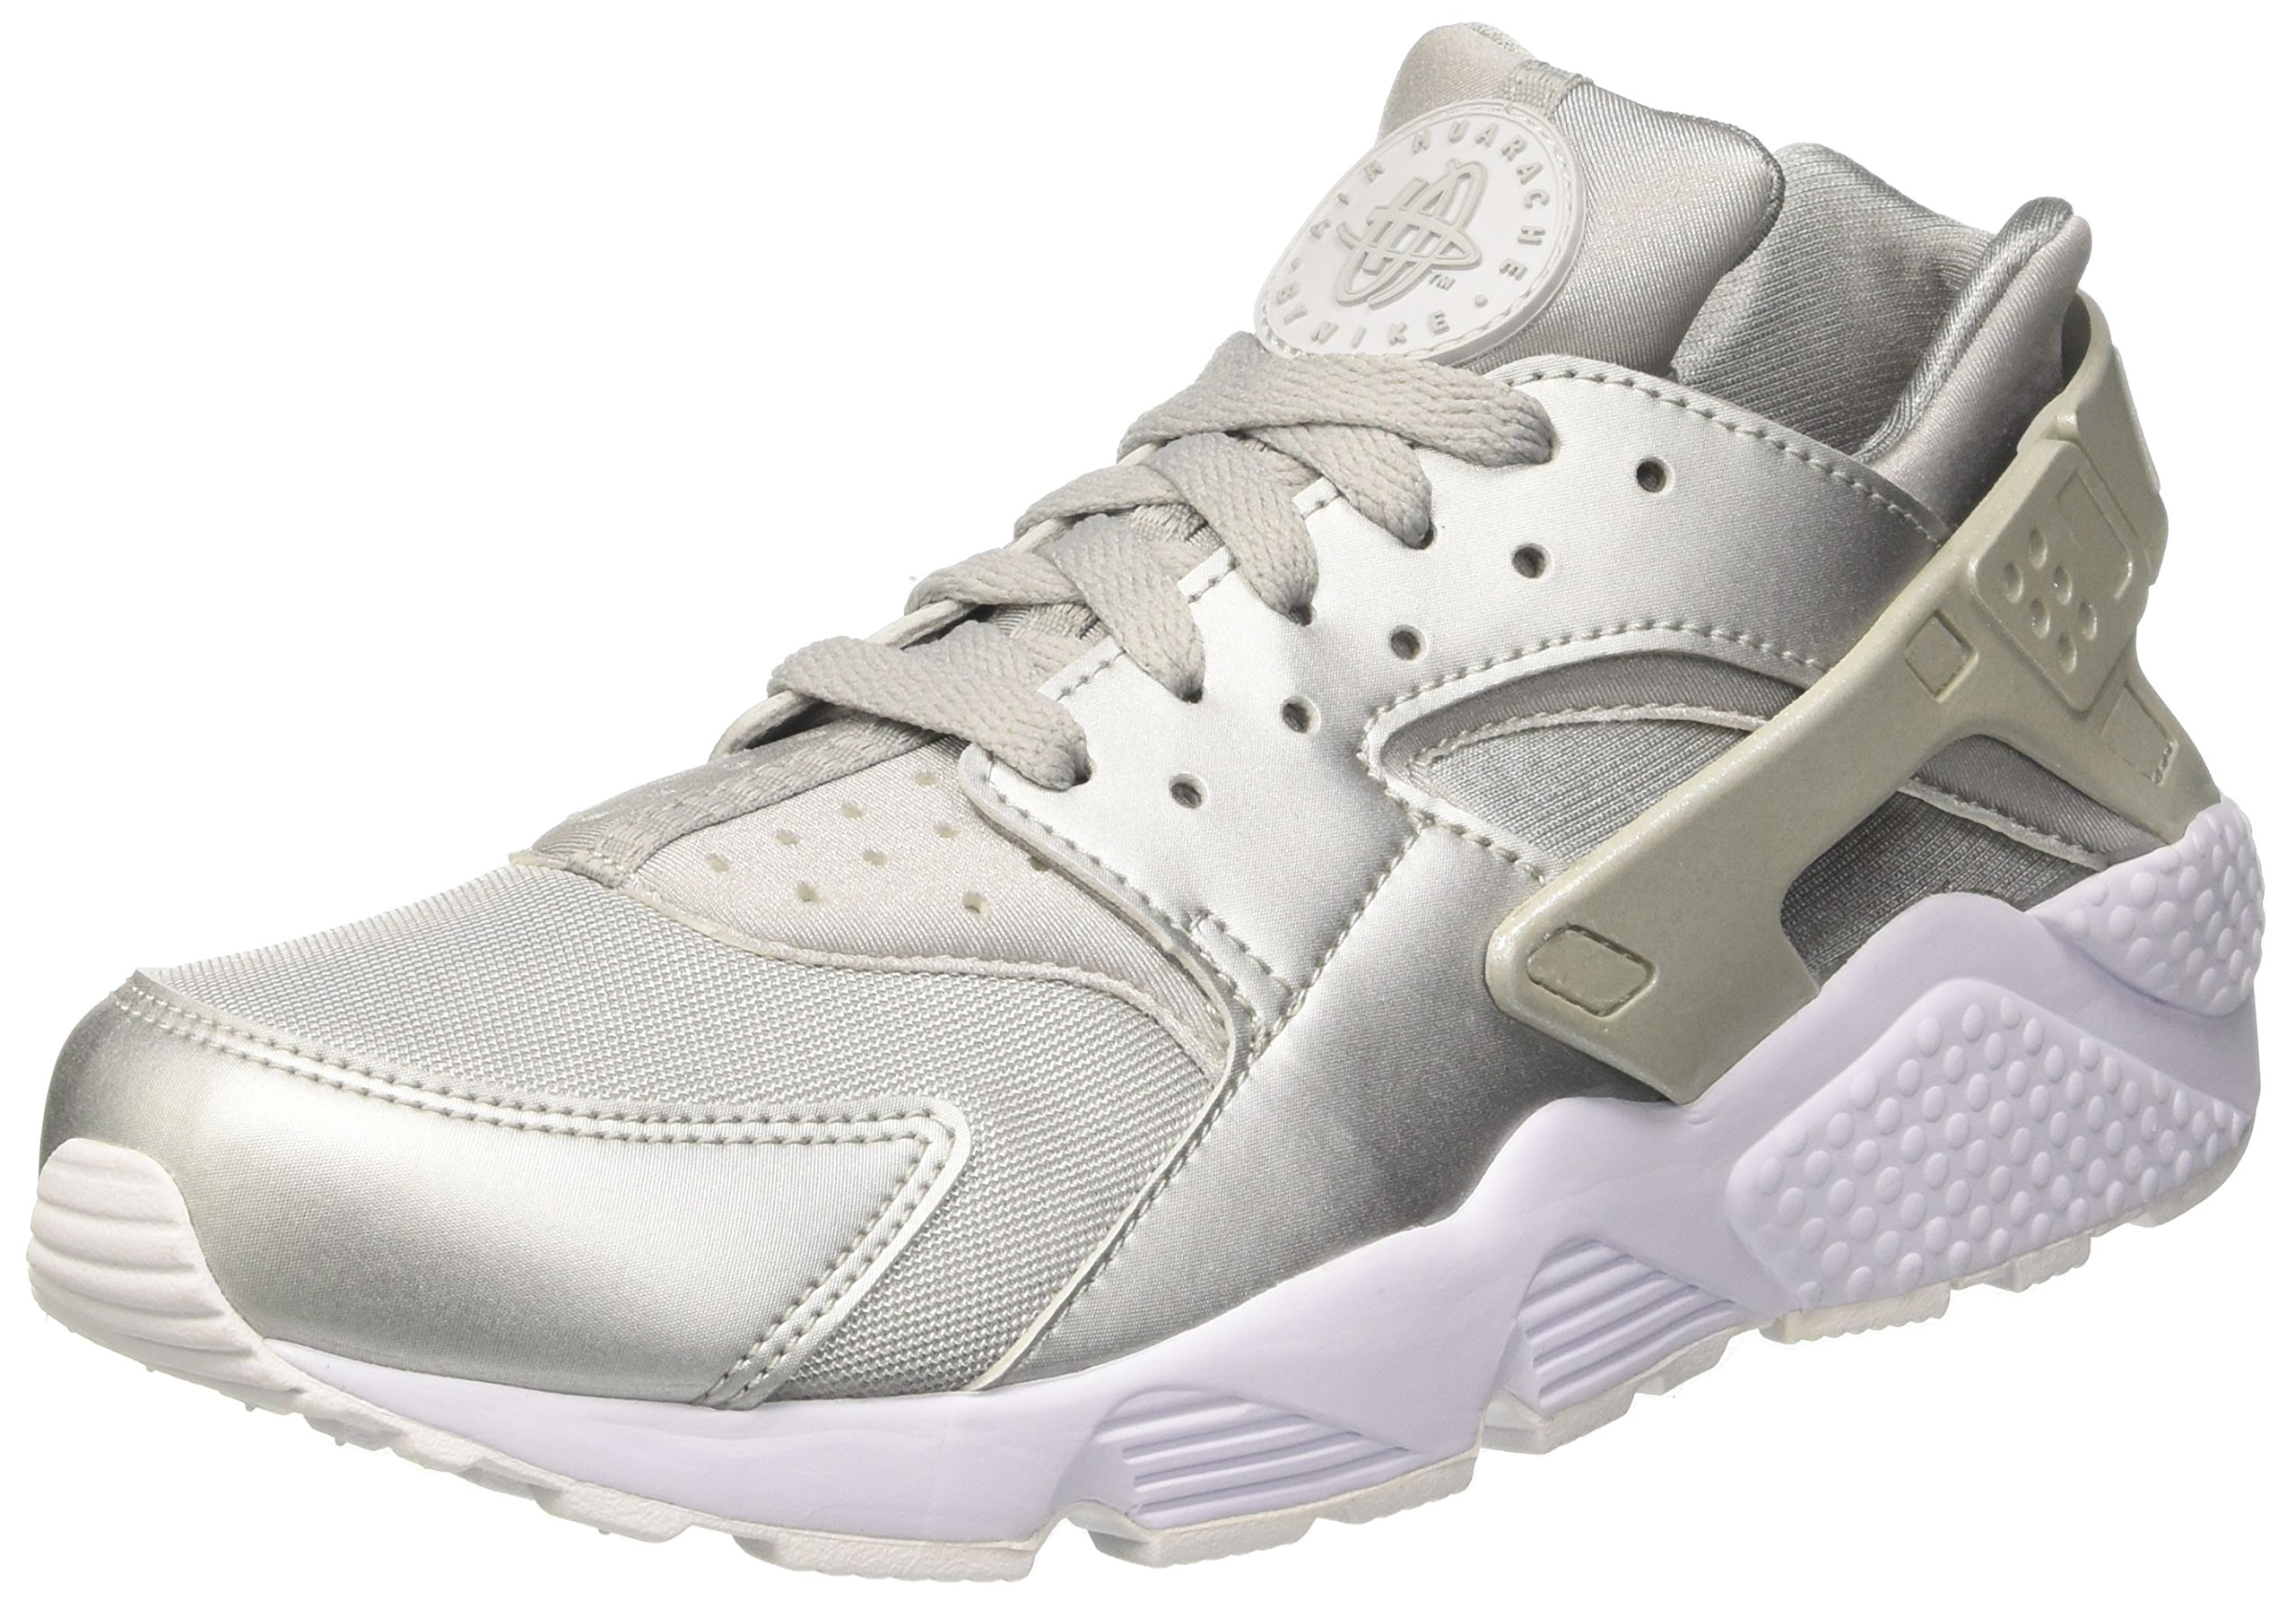 6362ad0d63362 Nike Mens Air Huarache Metalic Silver Nylon Size 11